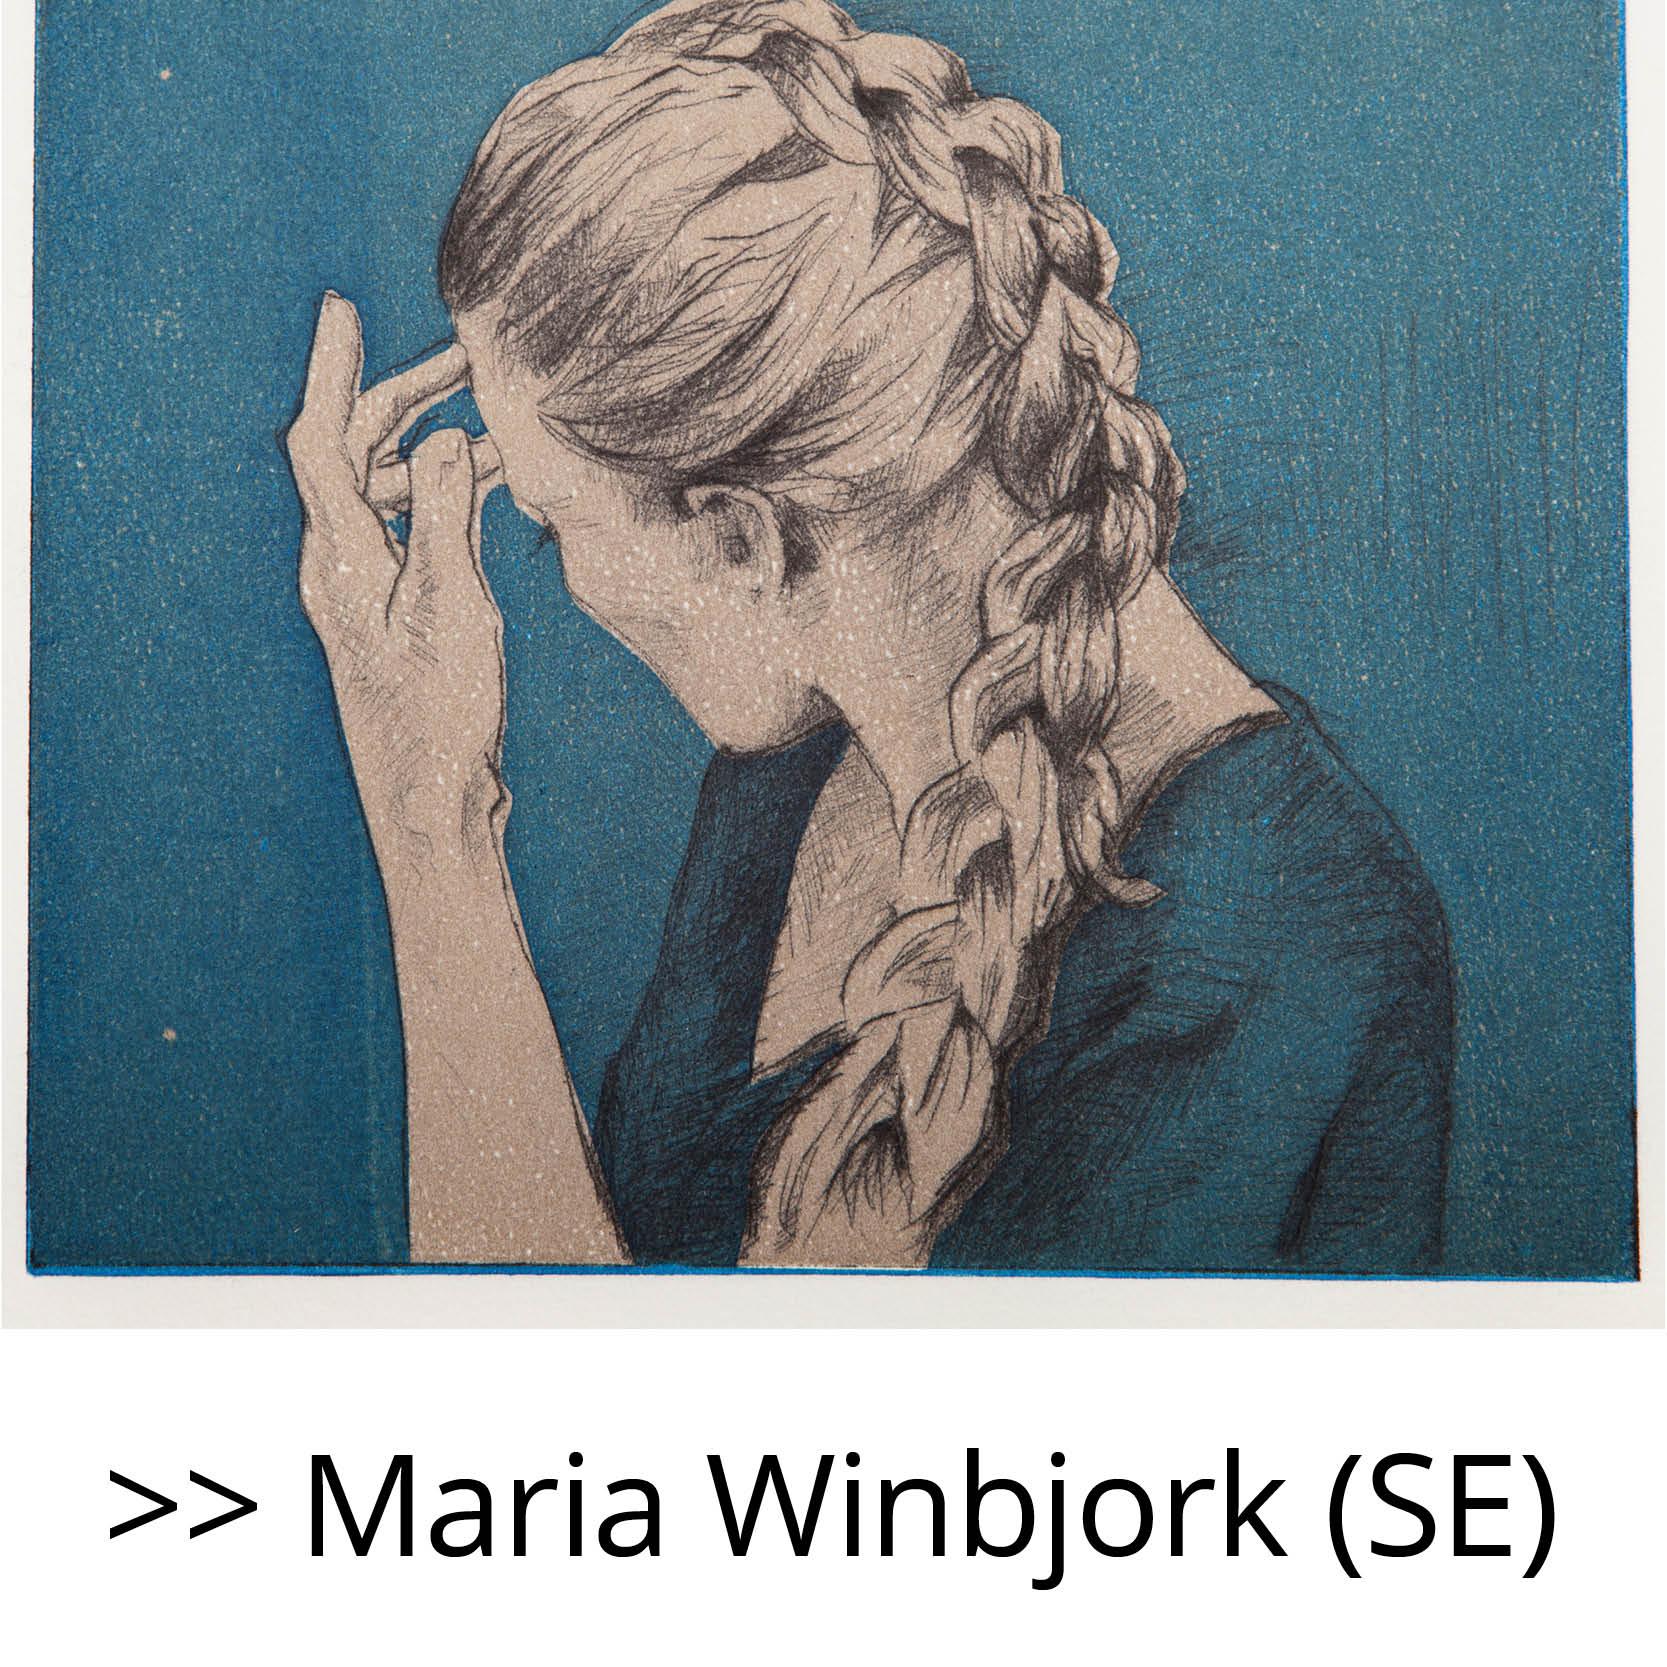 Maria_Winbjork_(SE)